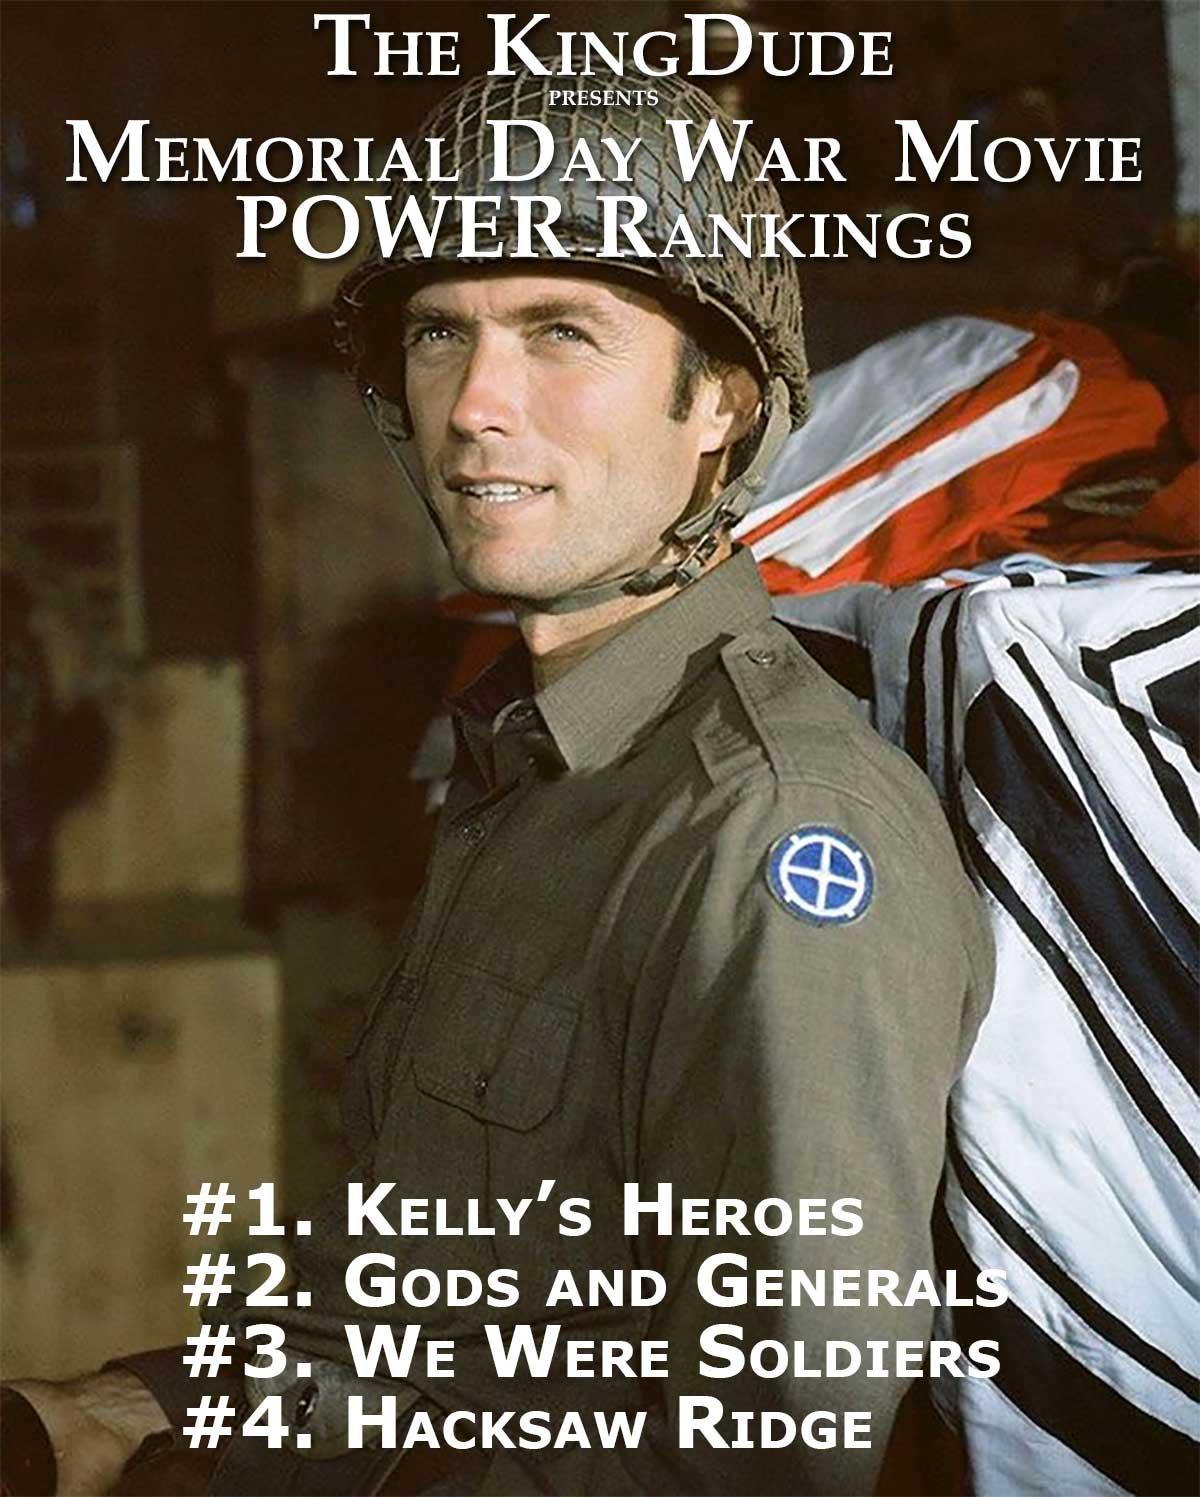 memorial-day-war-movies-power-rankings